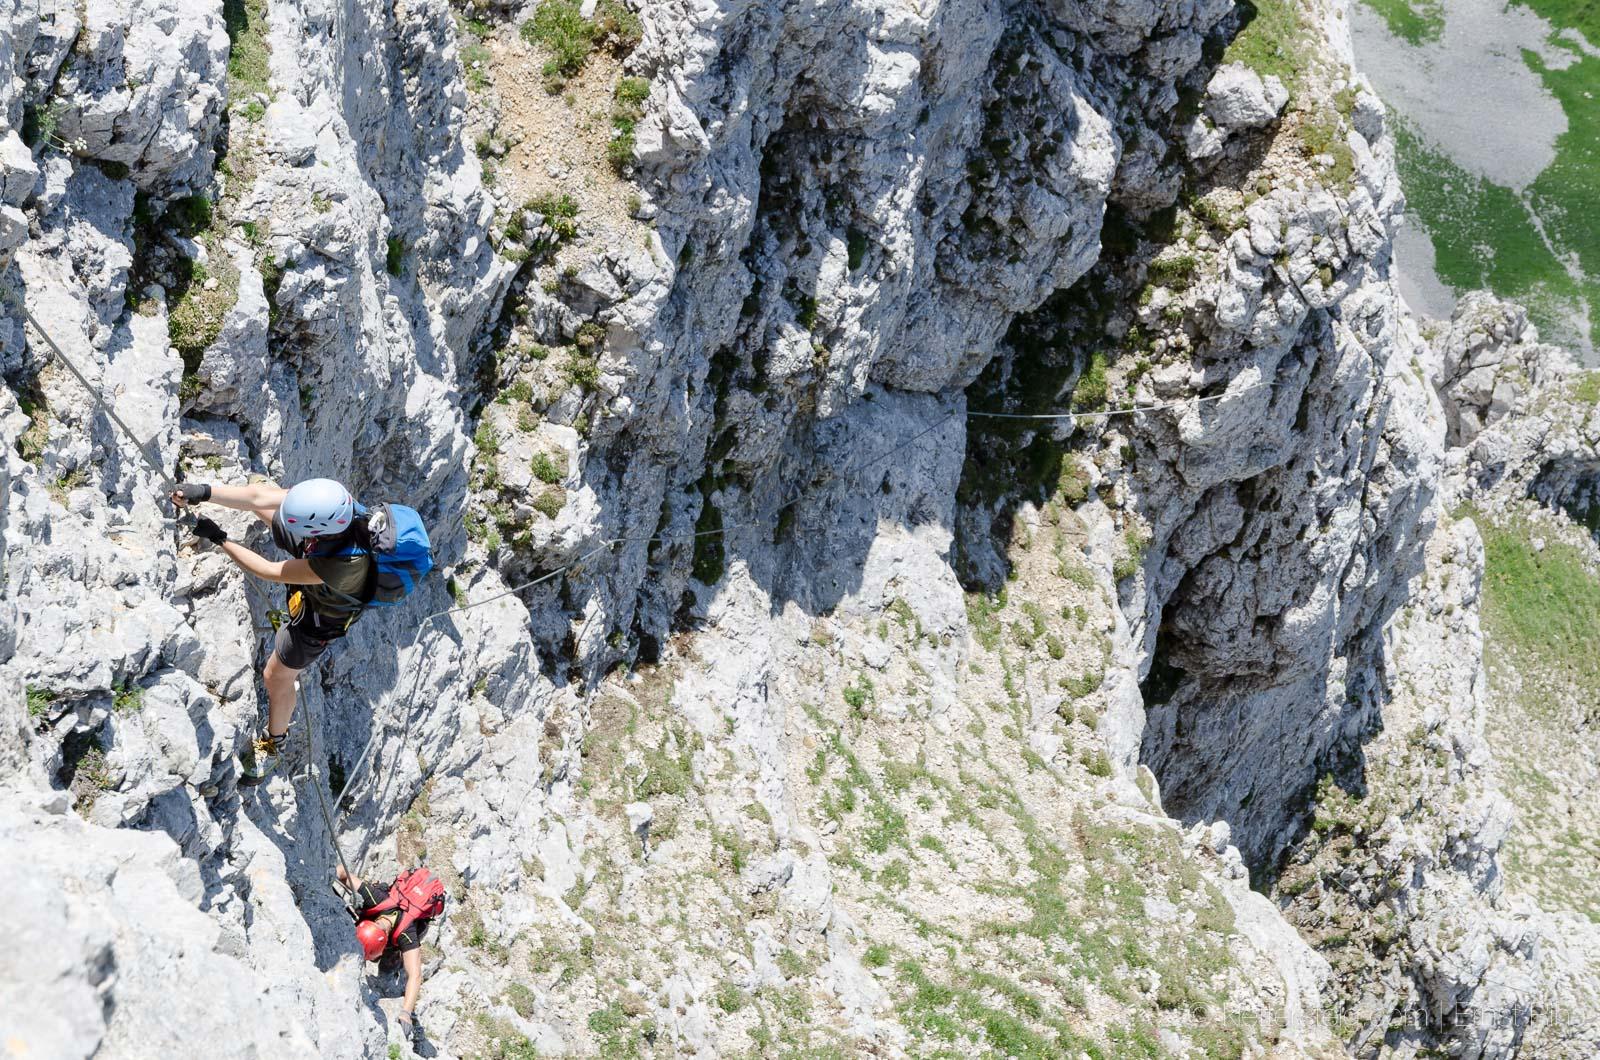 Klettersteig Köllenspitze : Südsporn klettersteig köllenspitze klettersteige